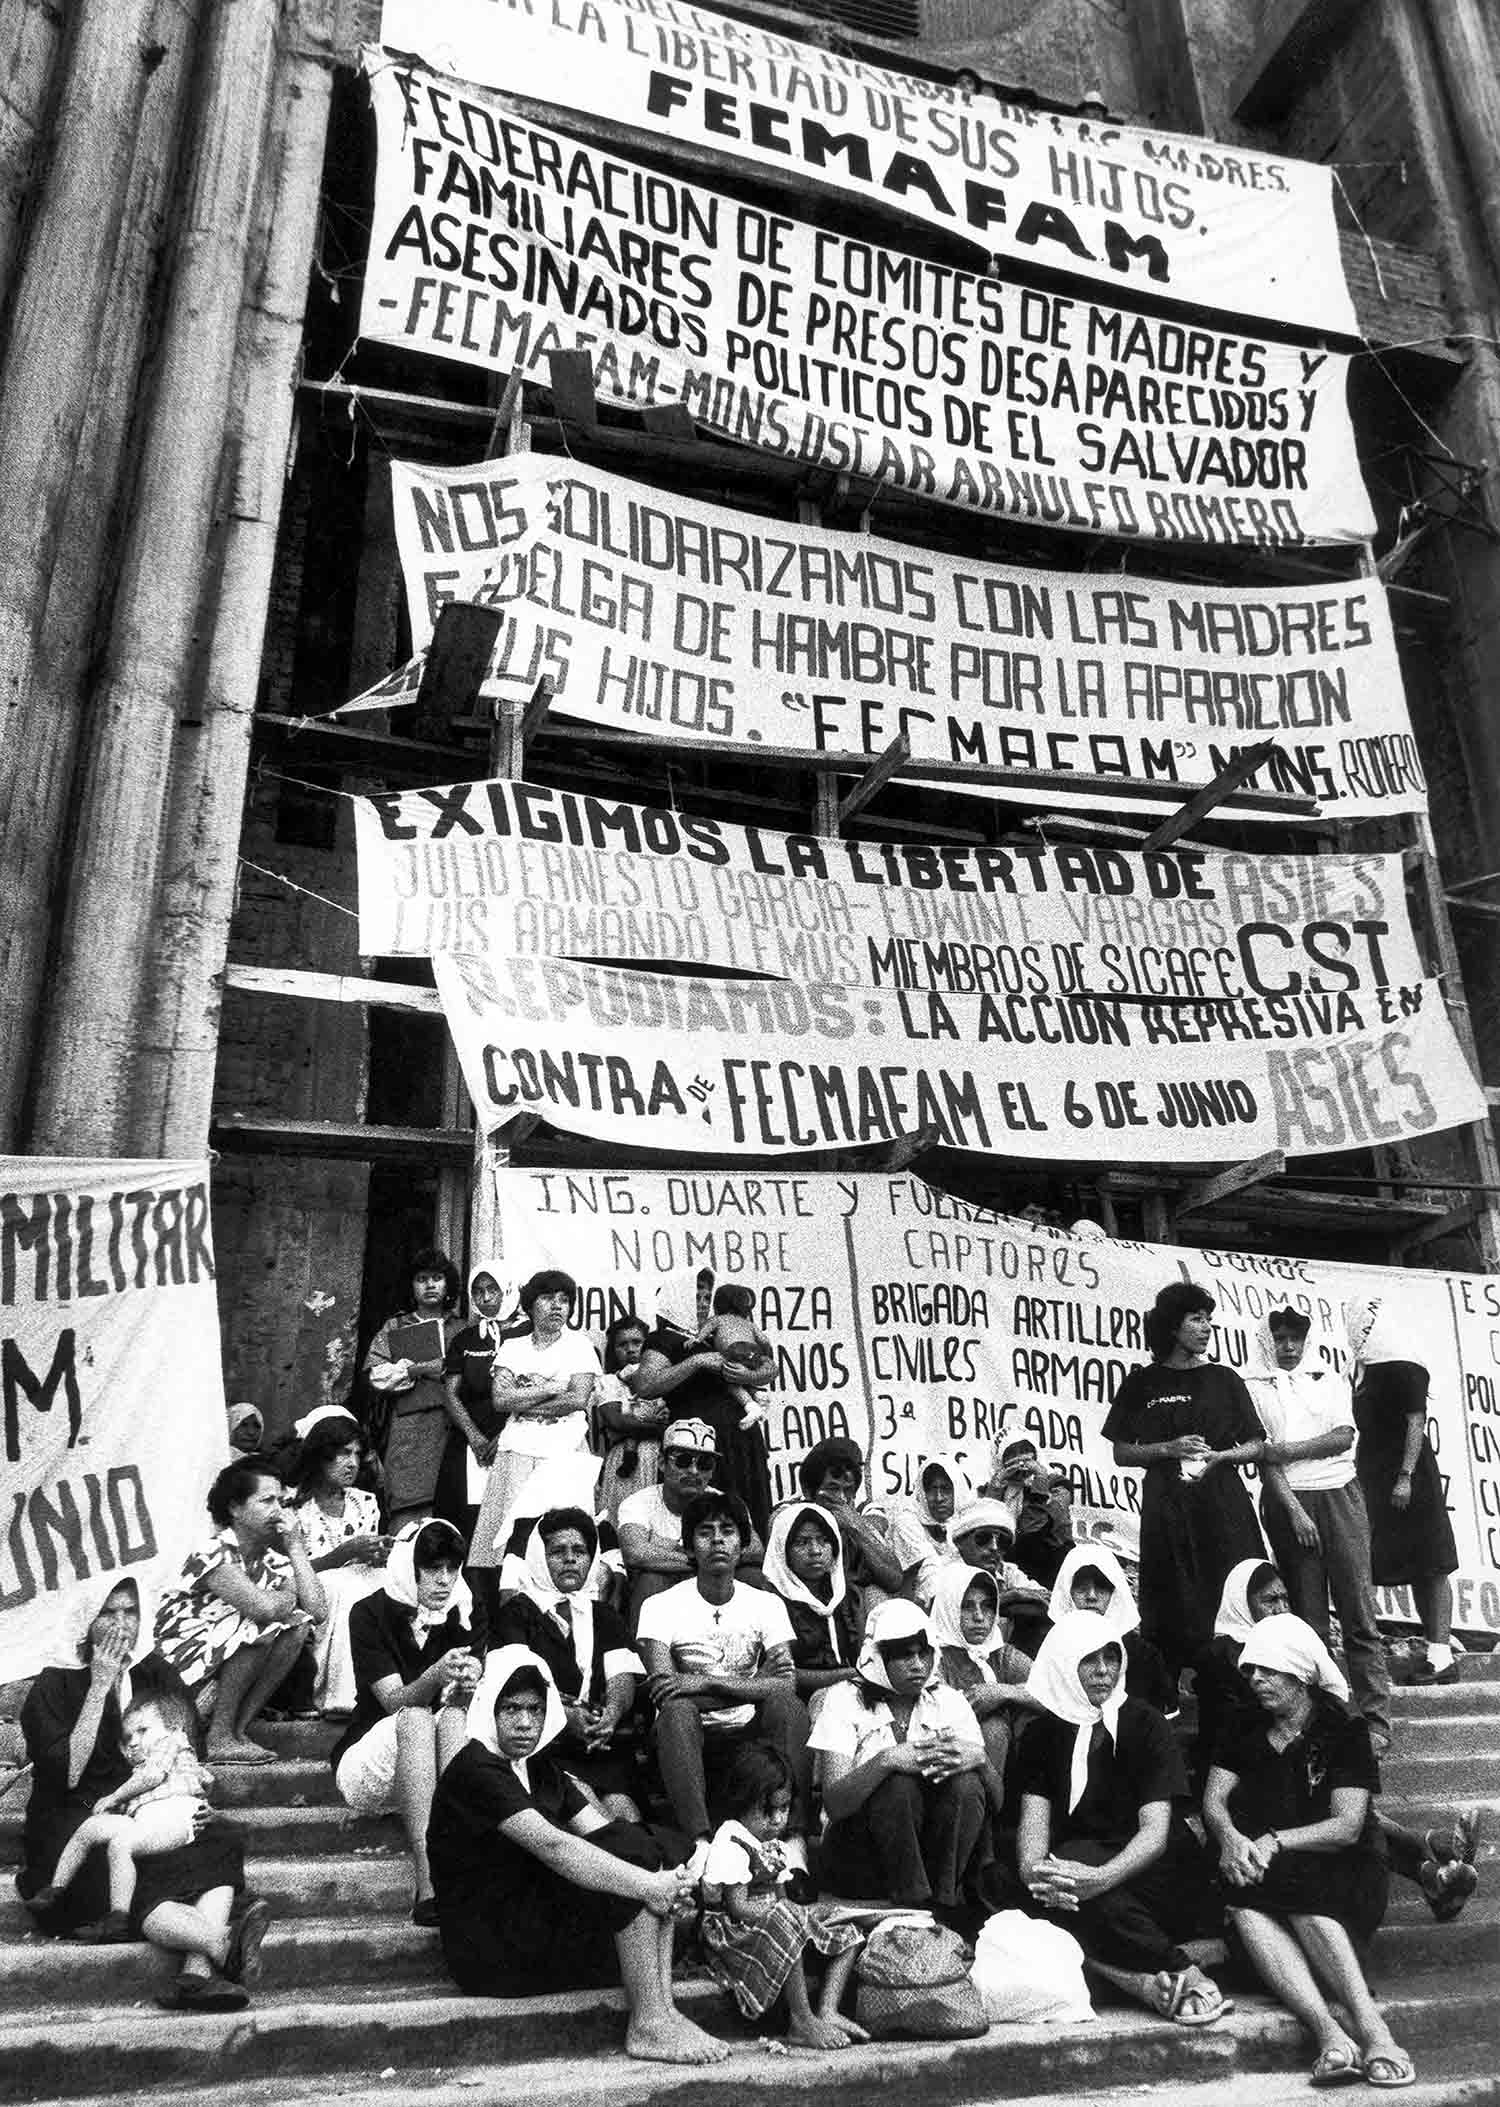 5-Protesta Comite de Madres, San Salvador 1987.